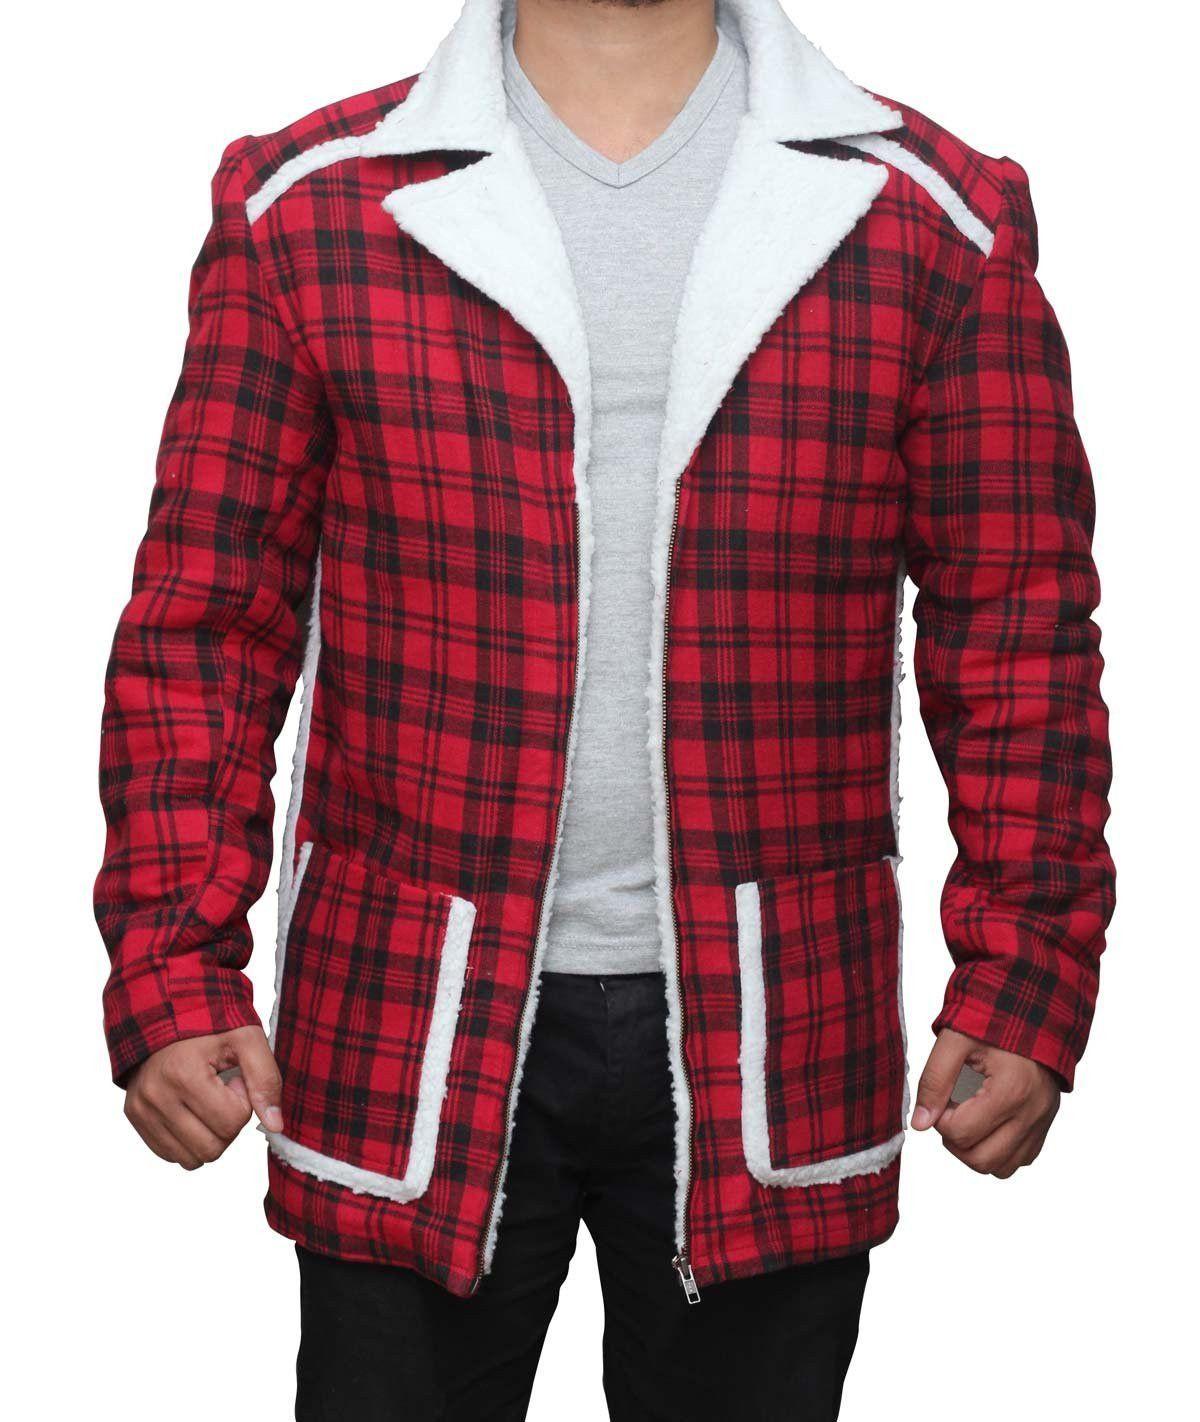 Ryan Reynolds Deadpool Shearling Jacket my swagg